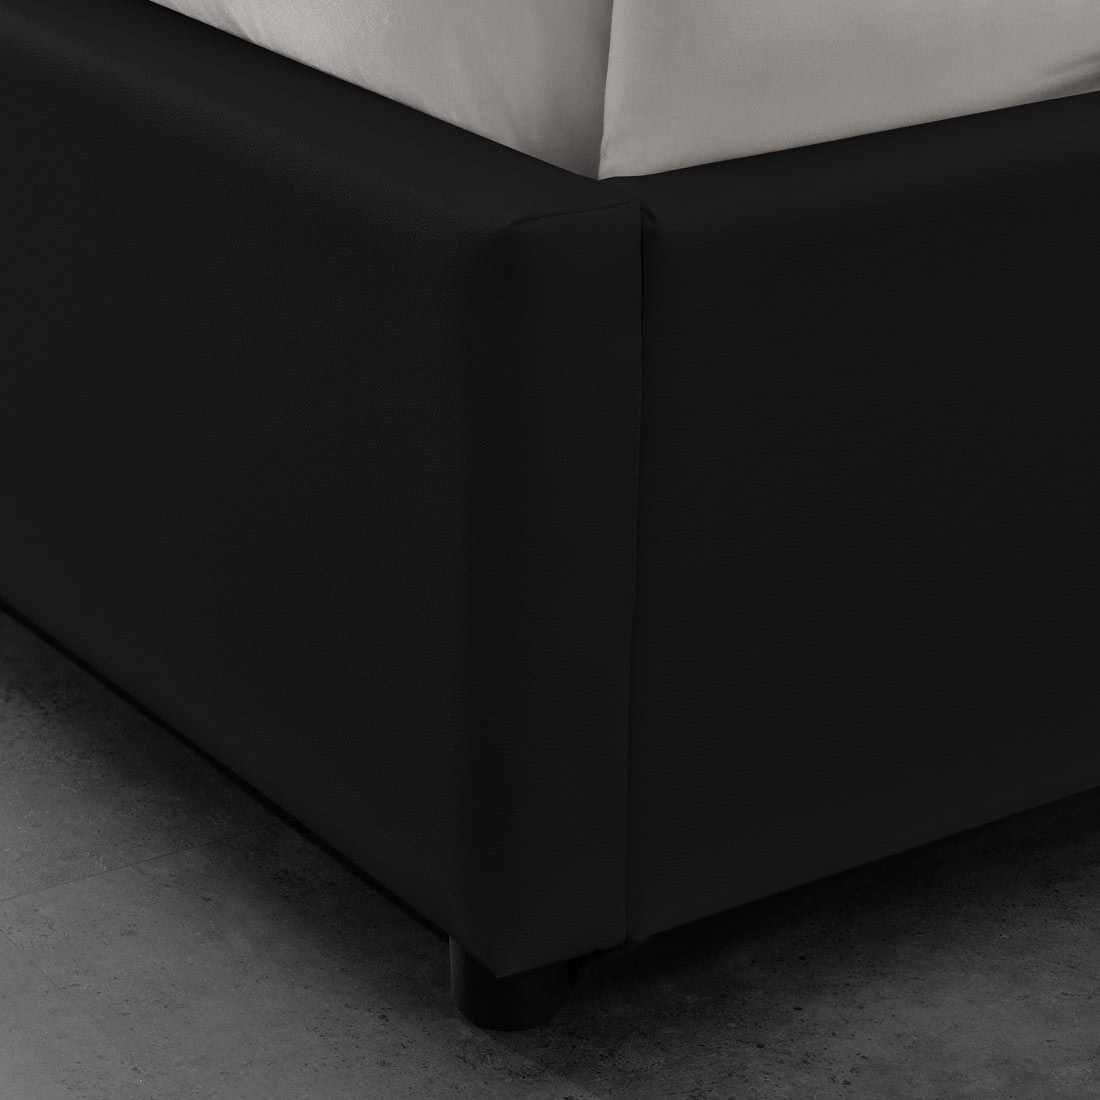 sommier coffre de rangement room meublerdesign. Black Bedroom Furniture Sets. Home Design Ideas